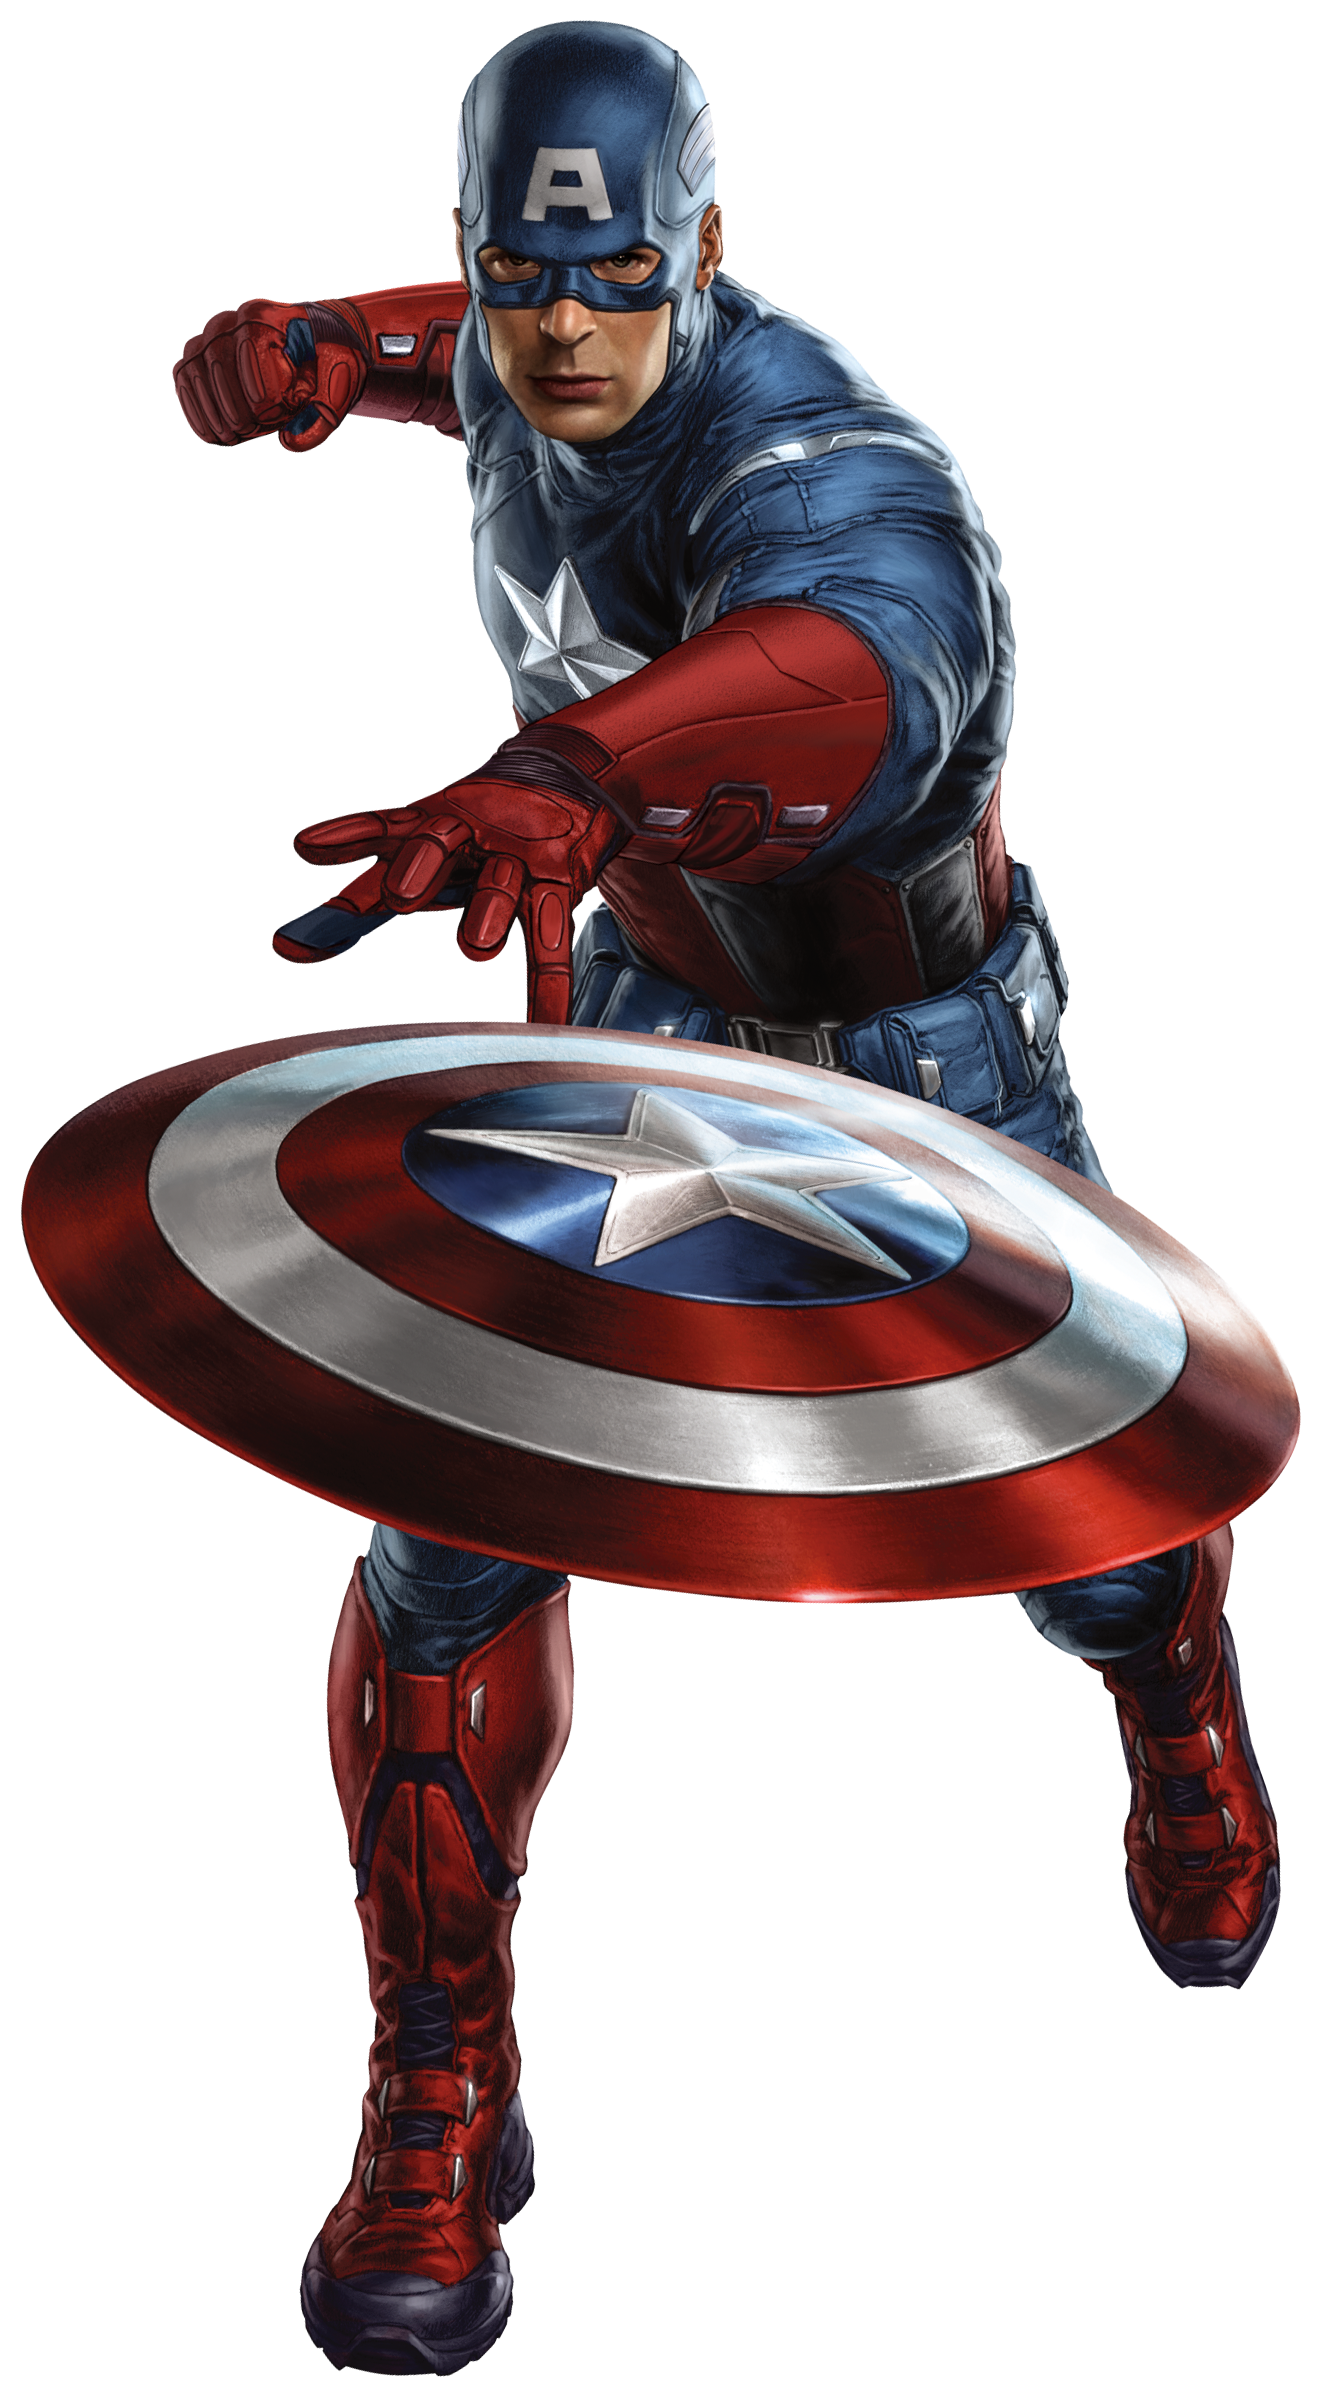 Http Images1 Wikia Nocookie Net Cb20130912042531 Disney Images C C0 Sjpa Captain America 4 Png Capitan America Dibujo Heroes Marvel Superheroes Marvel